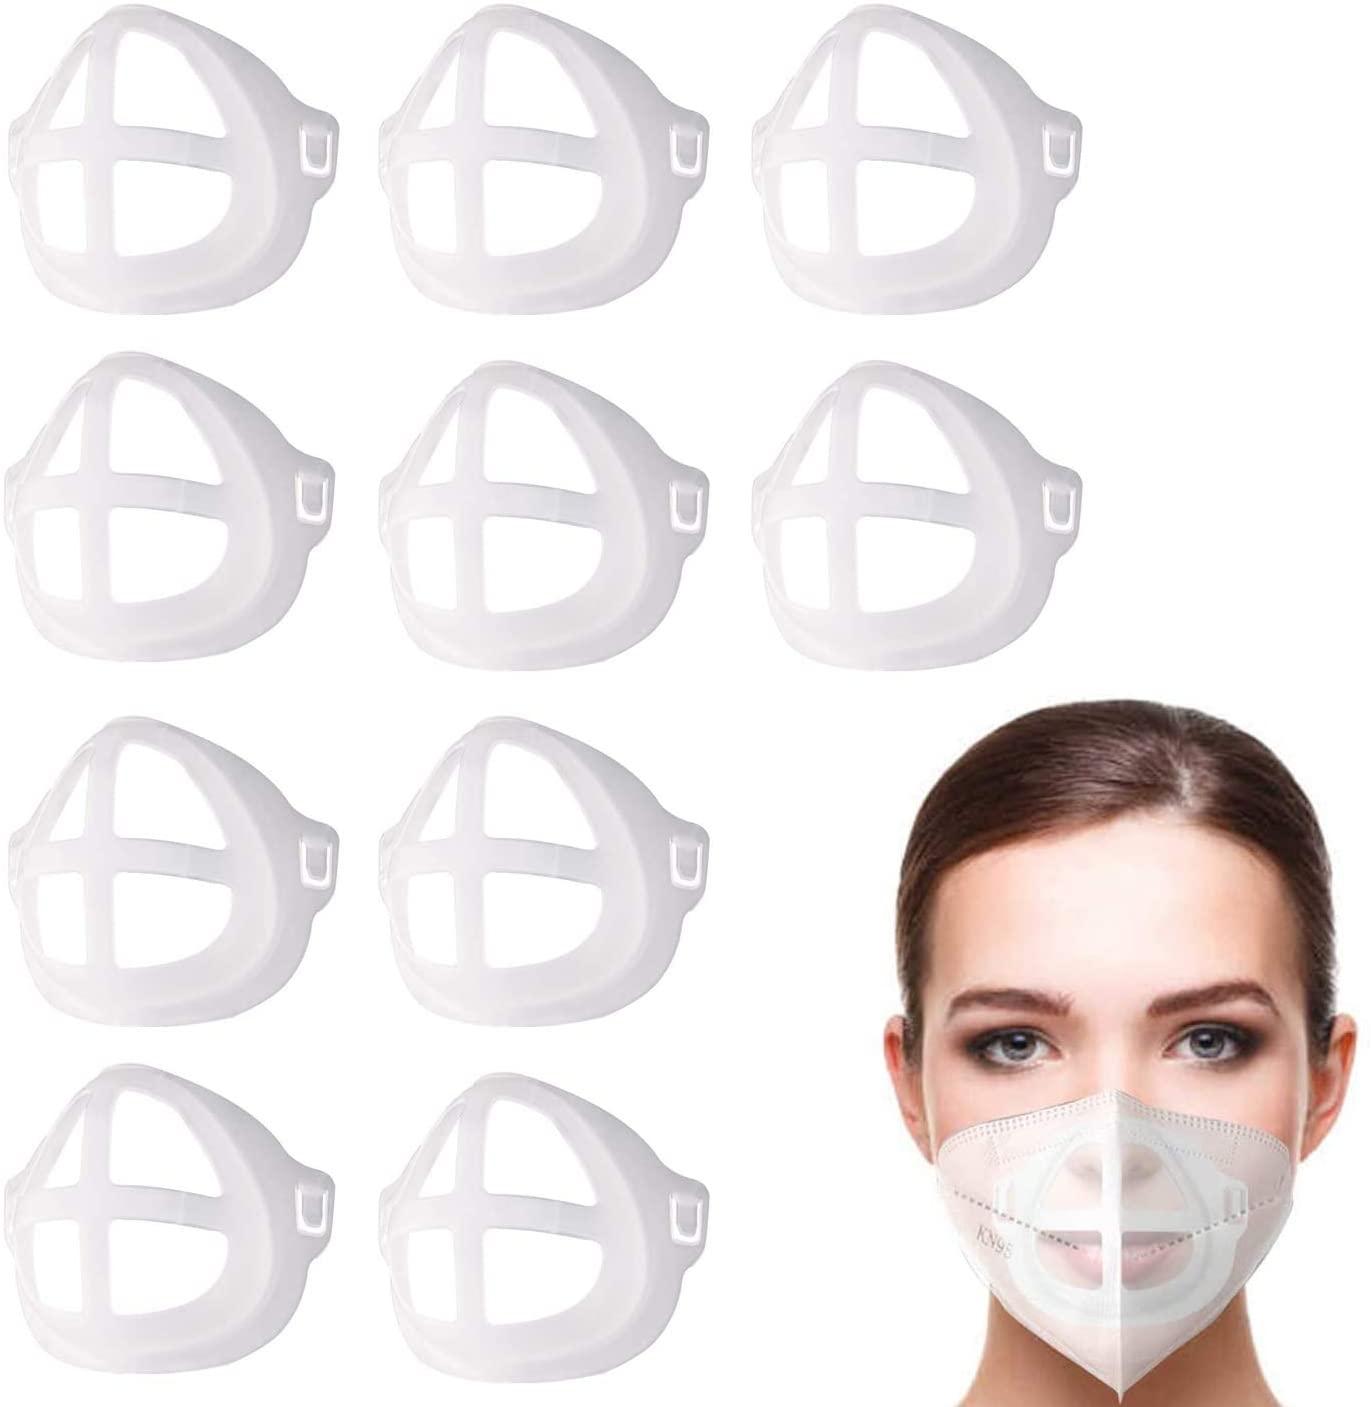 [10 PCS]3D Face Bracket Internal Support Frame,Breathable Face Inner Support Bracket,Reusable Face Lipstick Protector,Clear